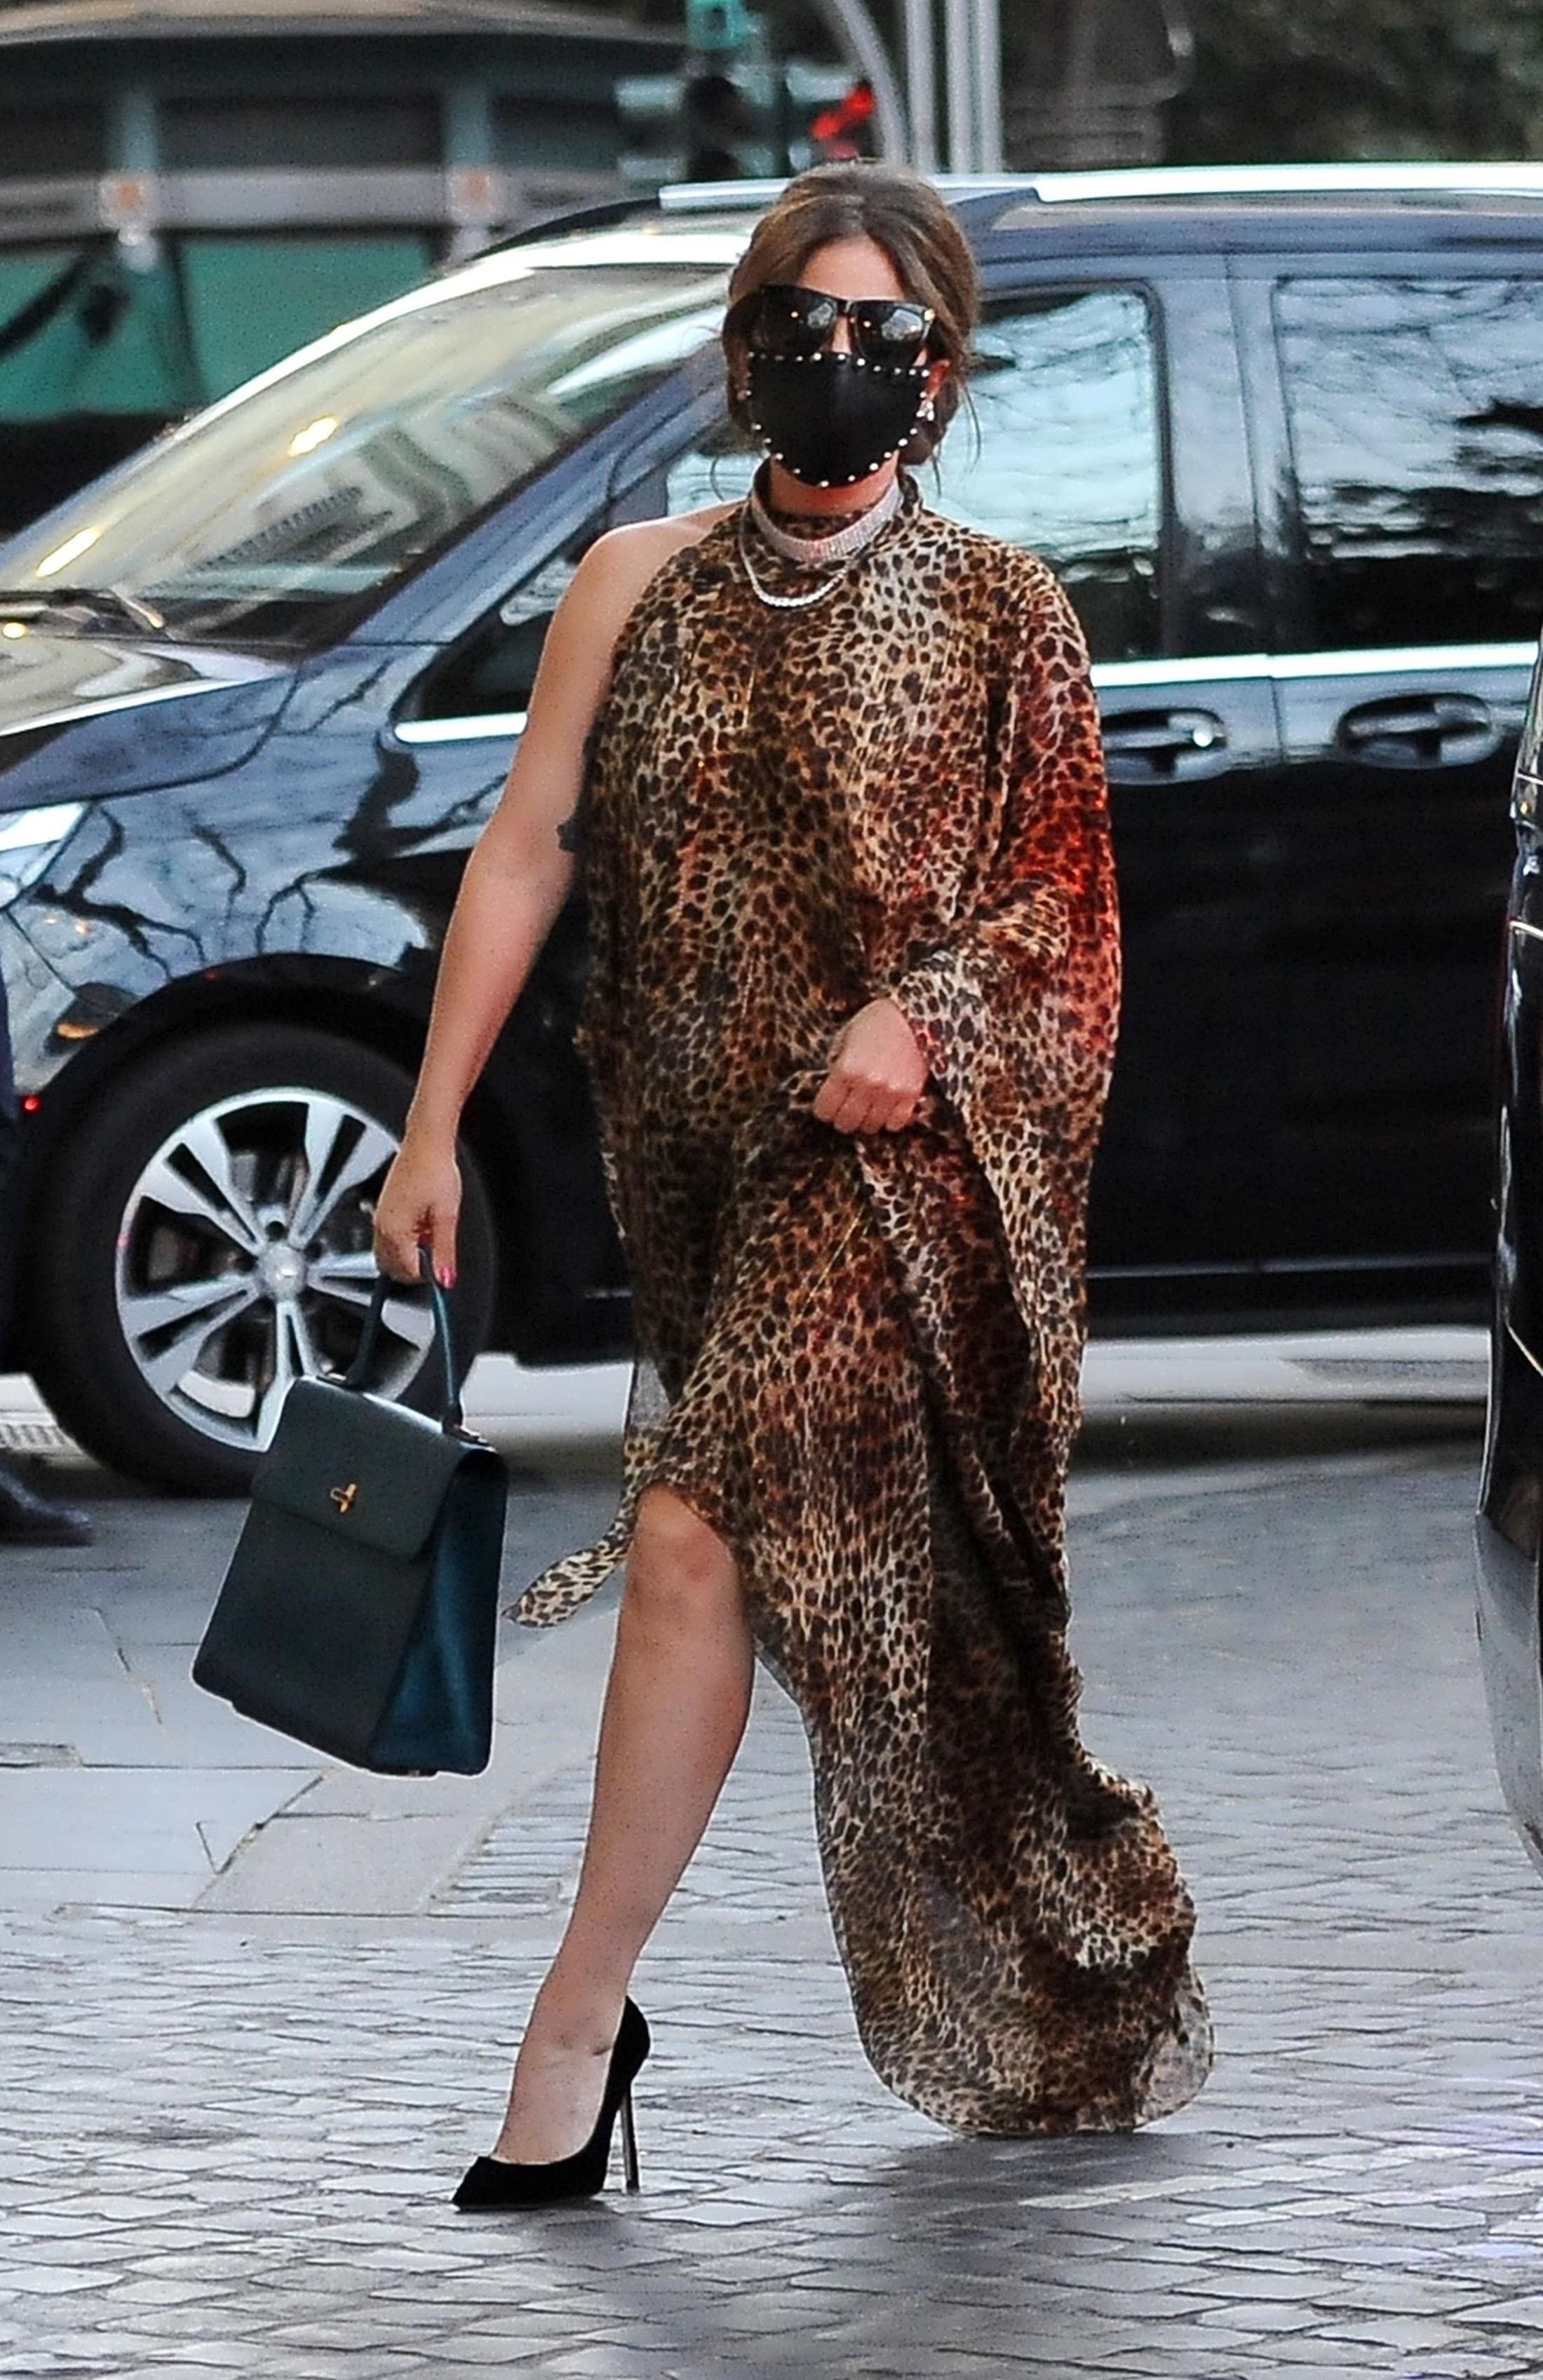 Gaga in a one shoulder caftan dress and heels